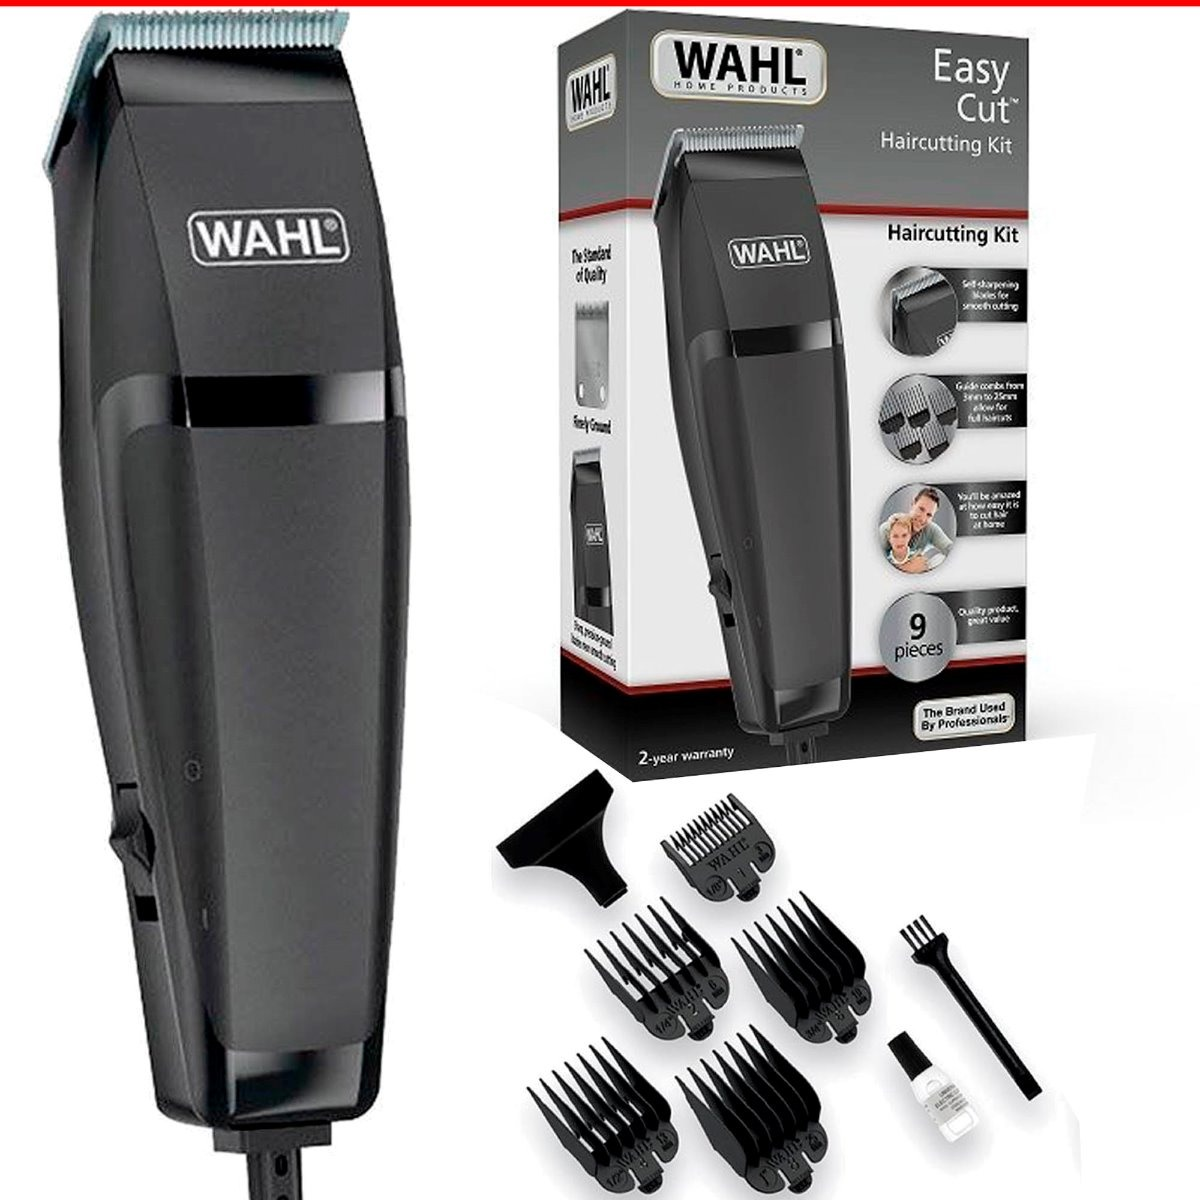 Máquina Cortar Cabelo Barba Wahl Clipper Easy Cut Preto 220v